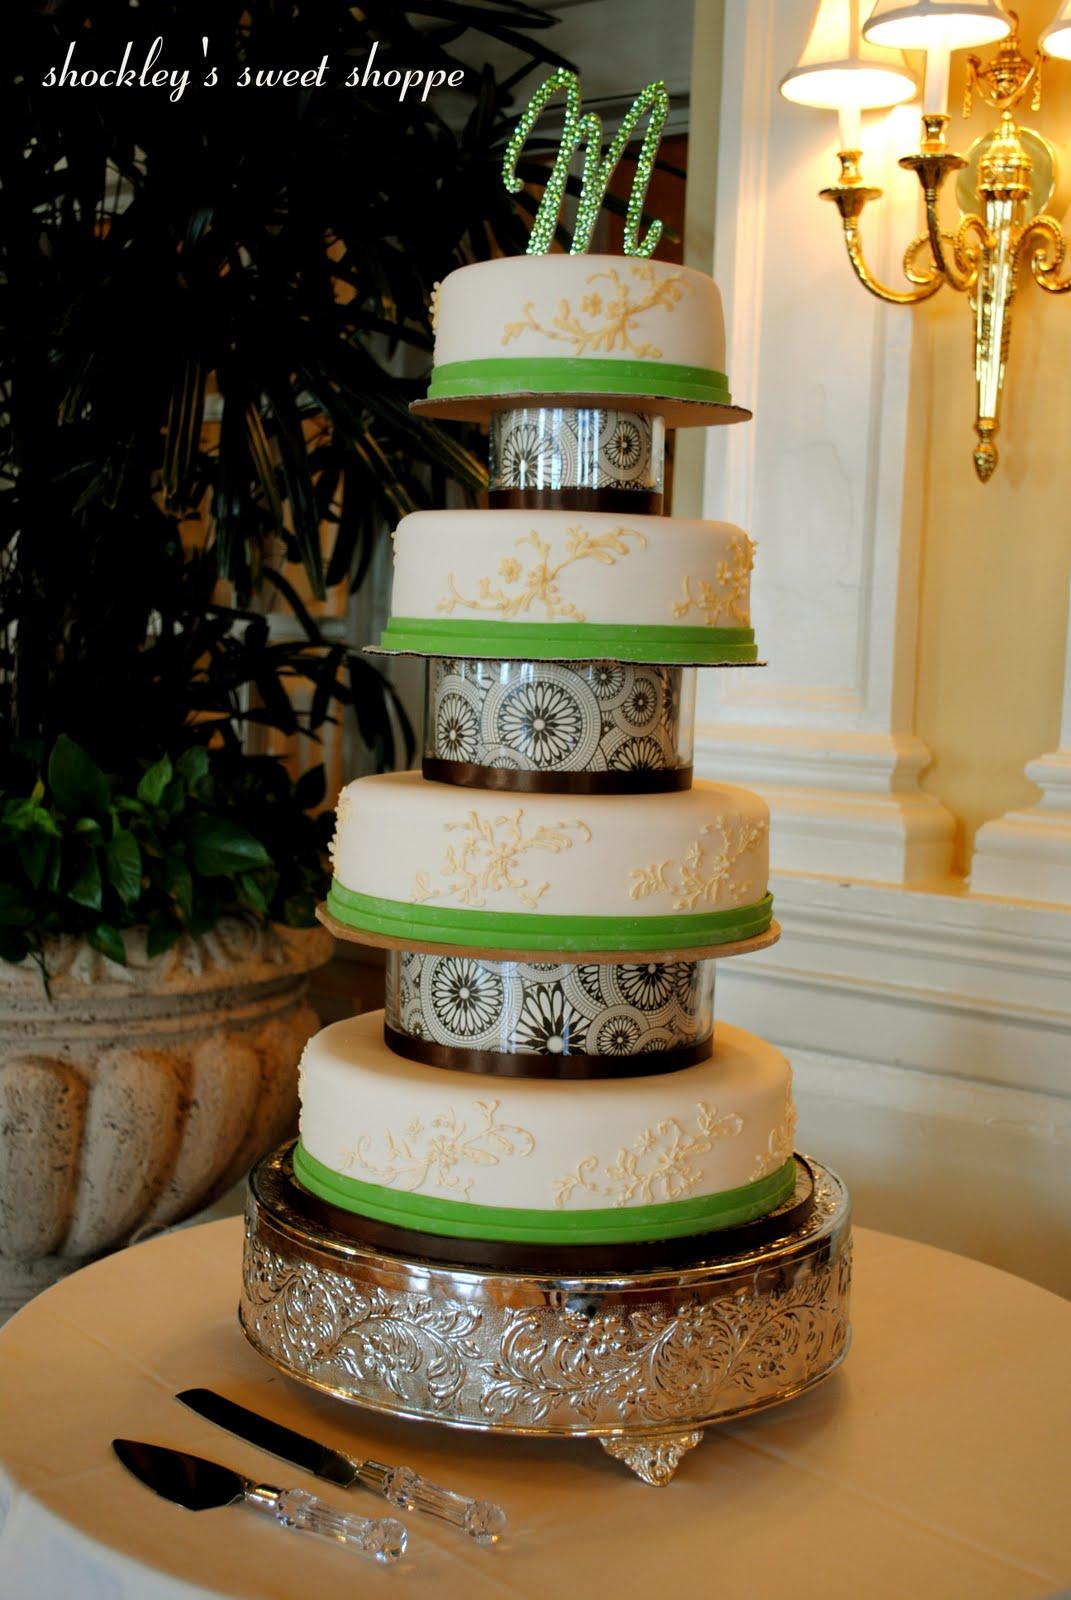 This amazing wedding cake for. This amazing wedding cake for